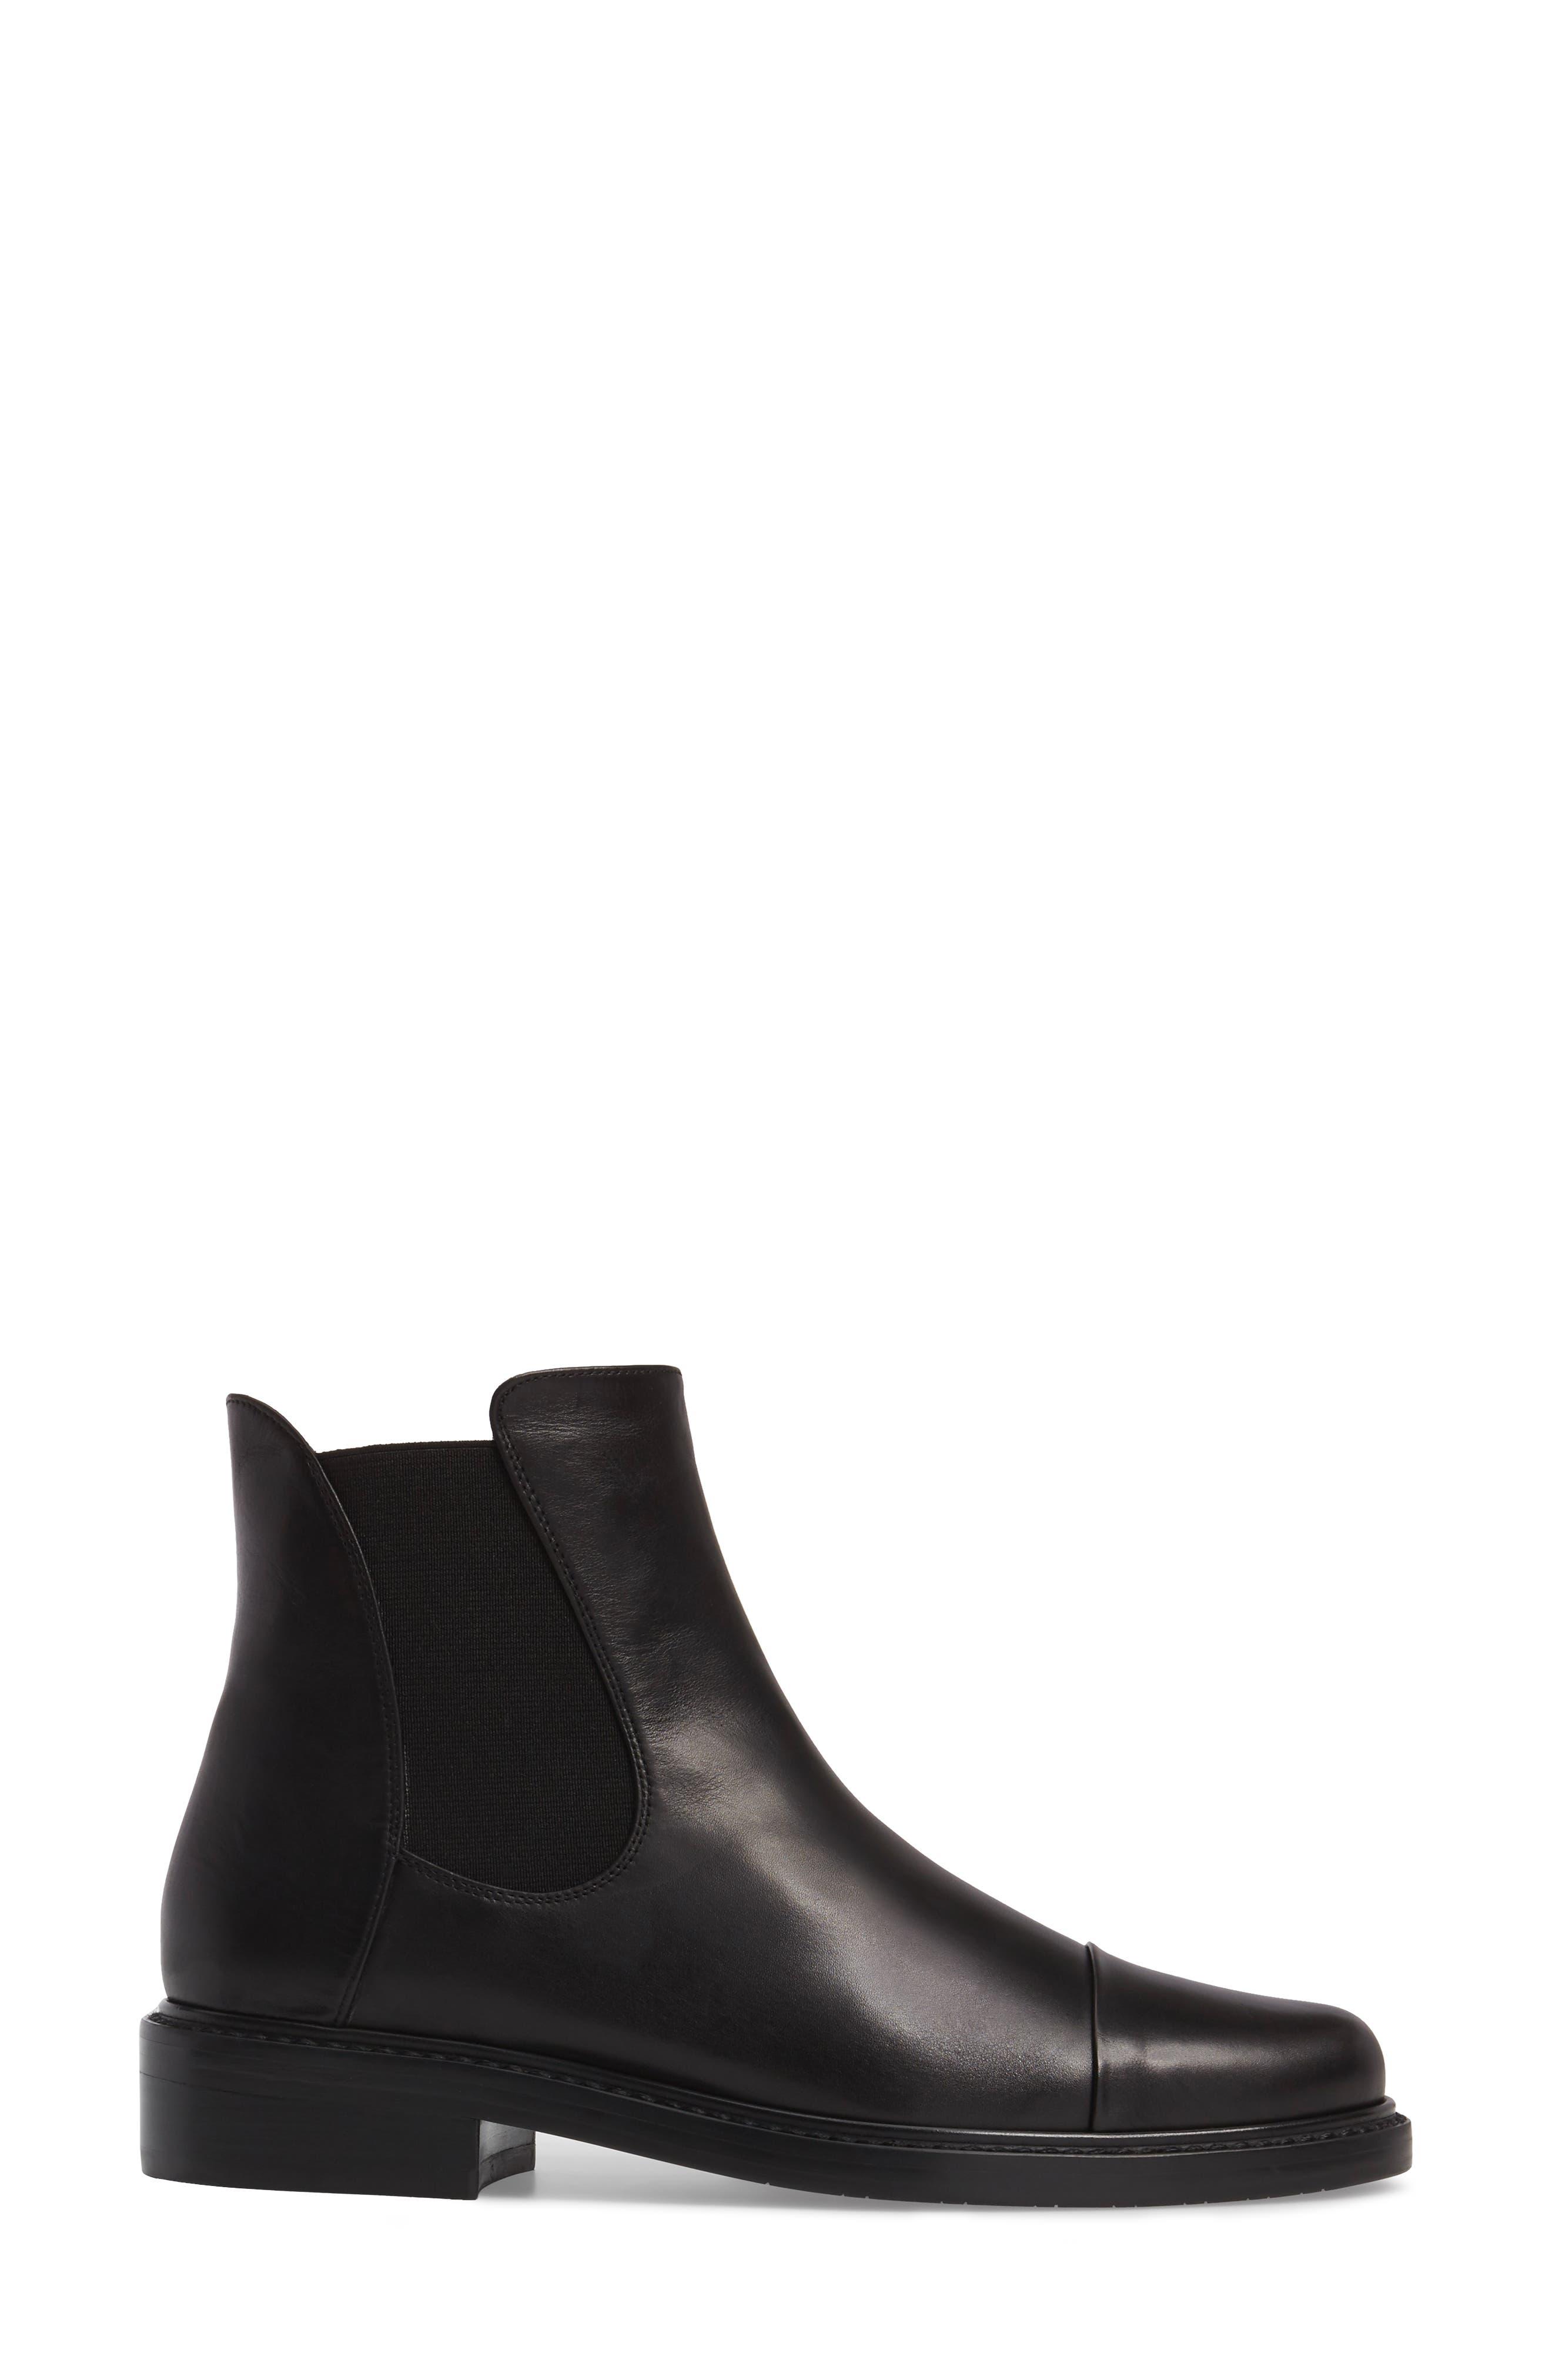 Gobi Cap Toe Chelsea Boot,                             Alternate thumbnail 3, color,                             Black Calf